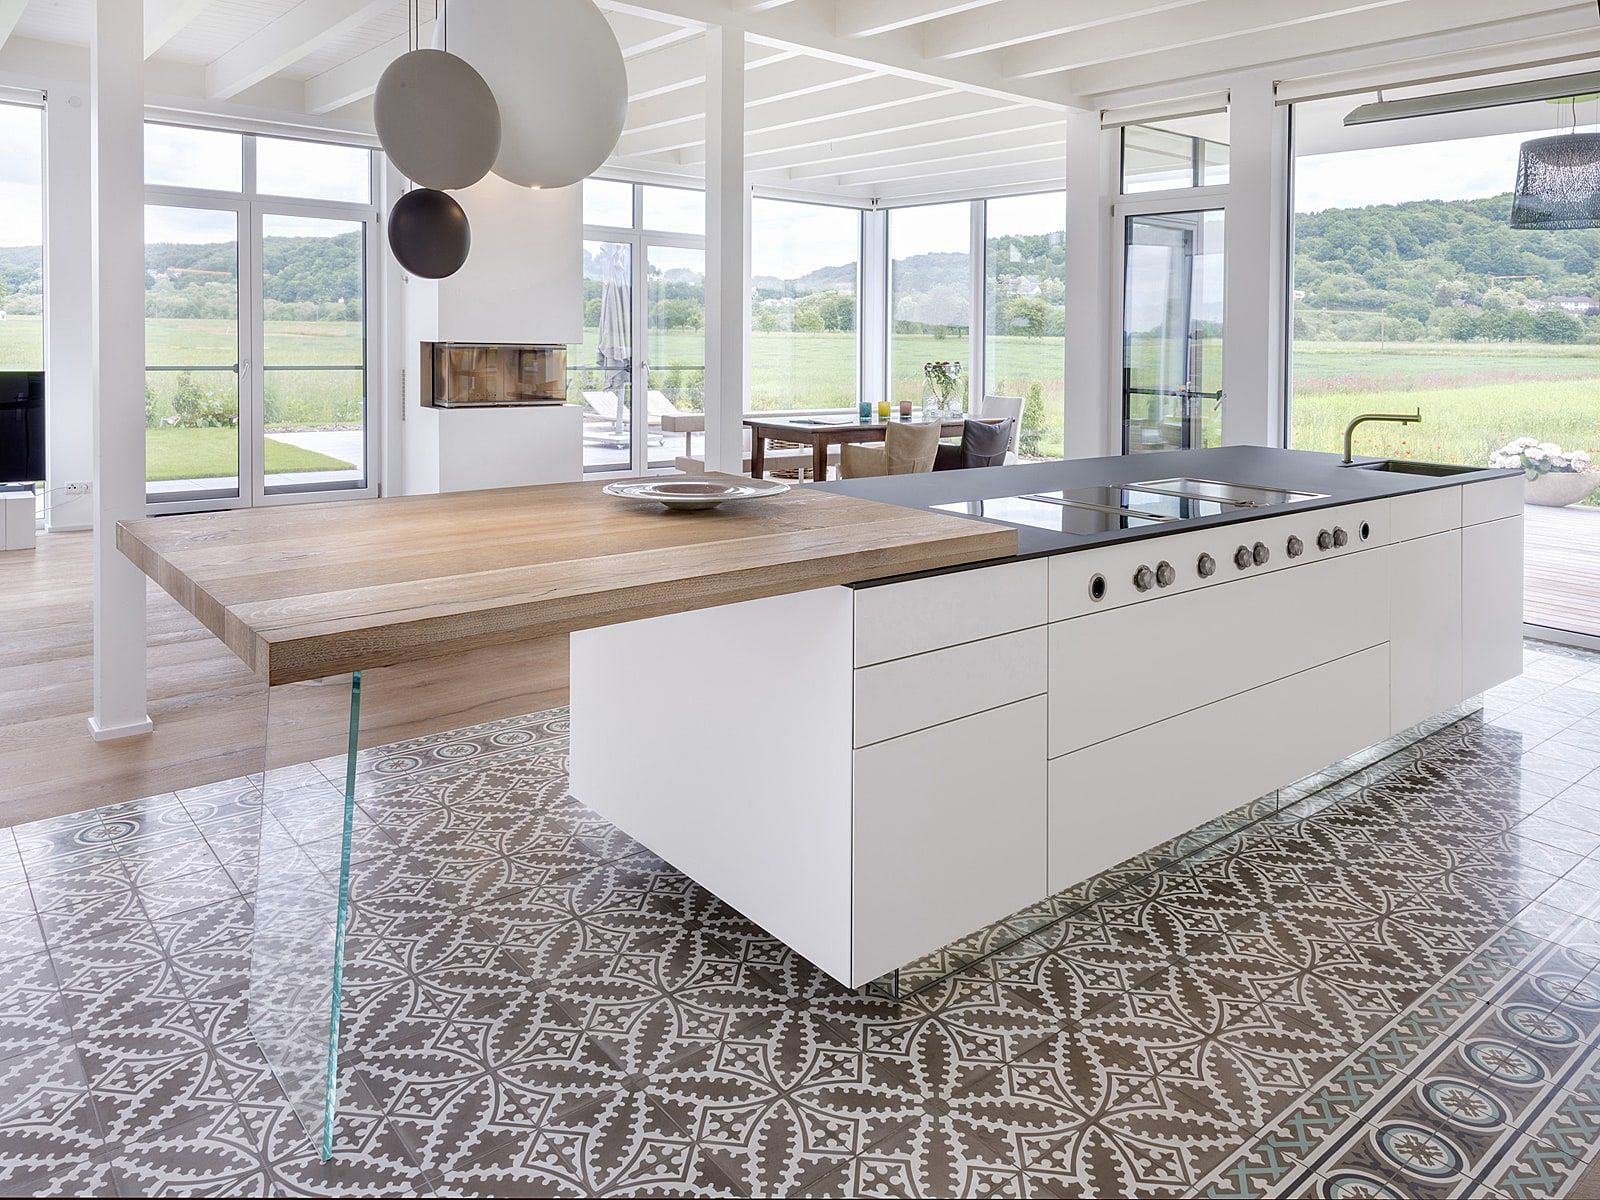 platten bild nº 0276  moderne küche küchenboden küchen